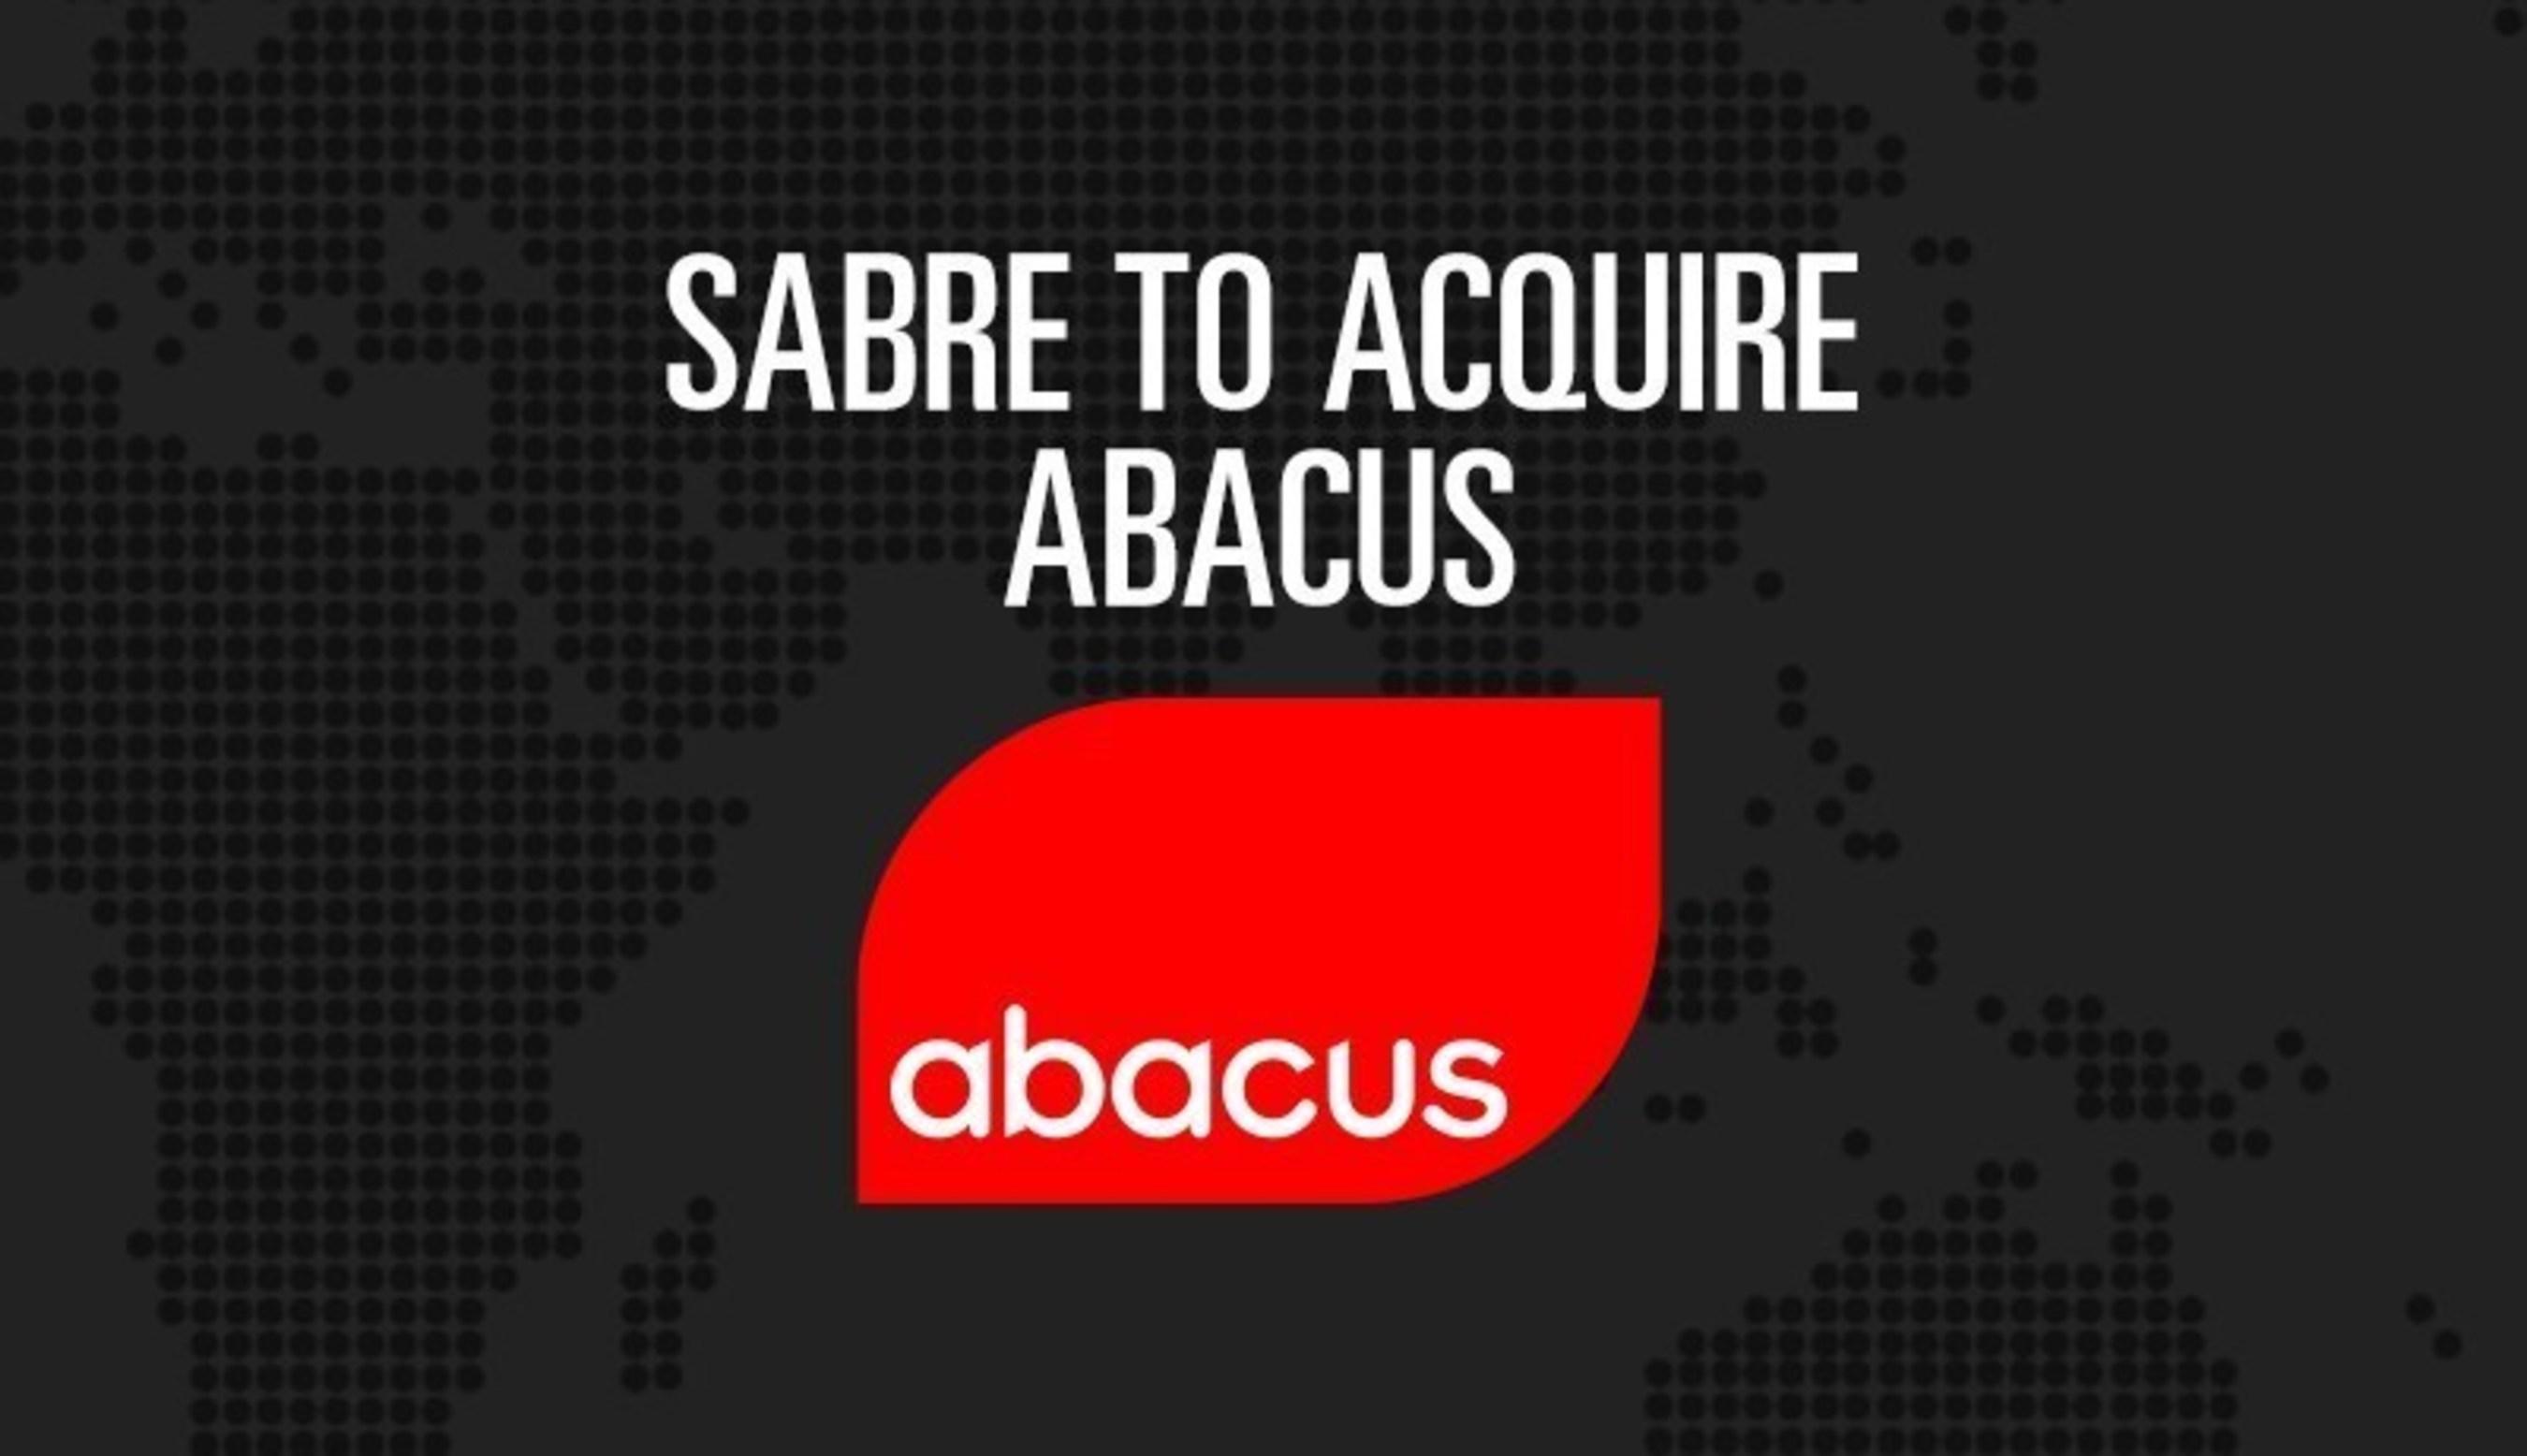 Sabre rachète Abacus International